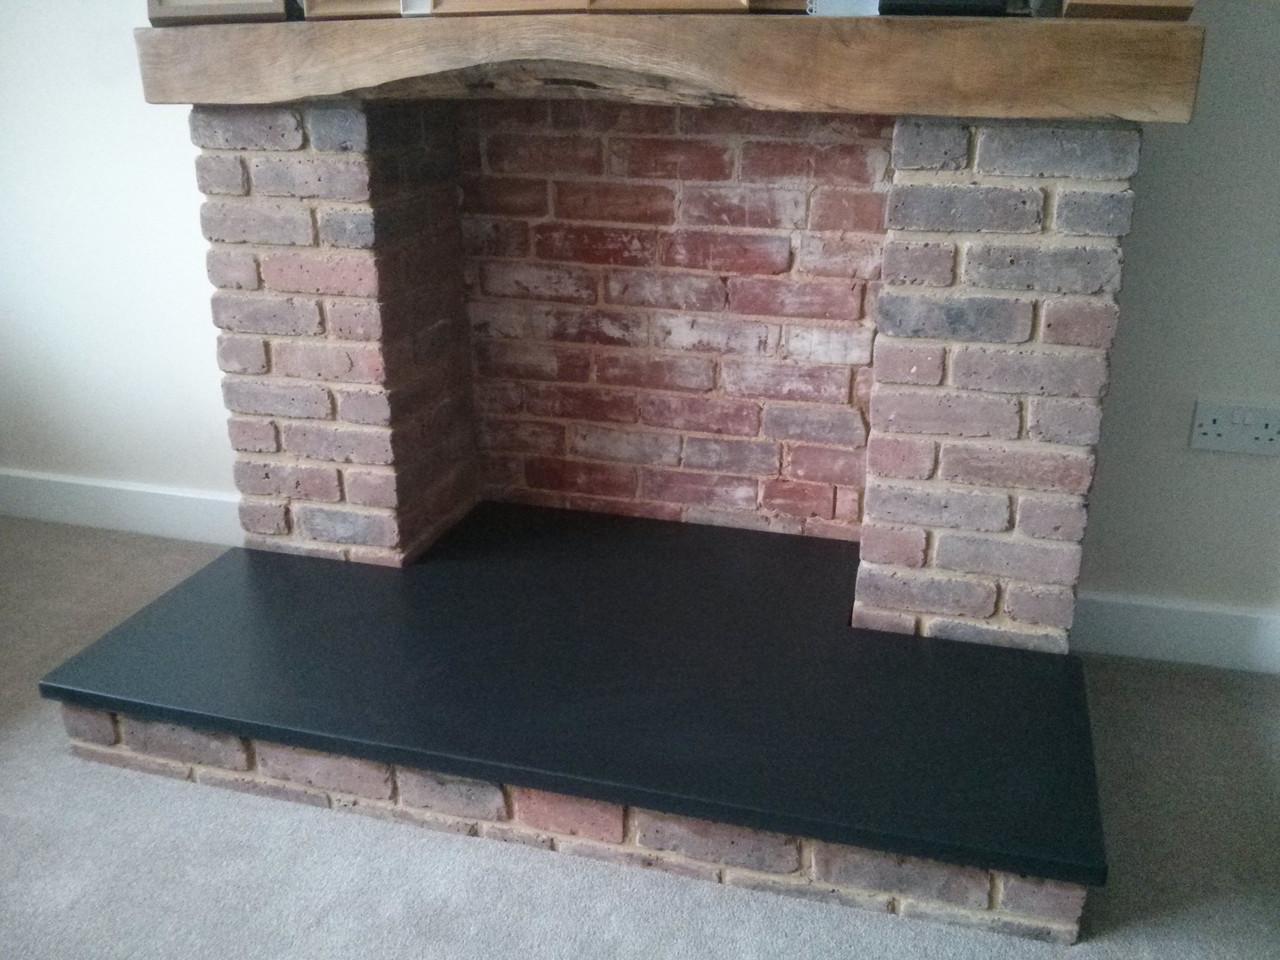 Honed black slate fireplace hearth around brick fireplace.